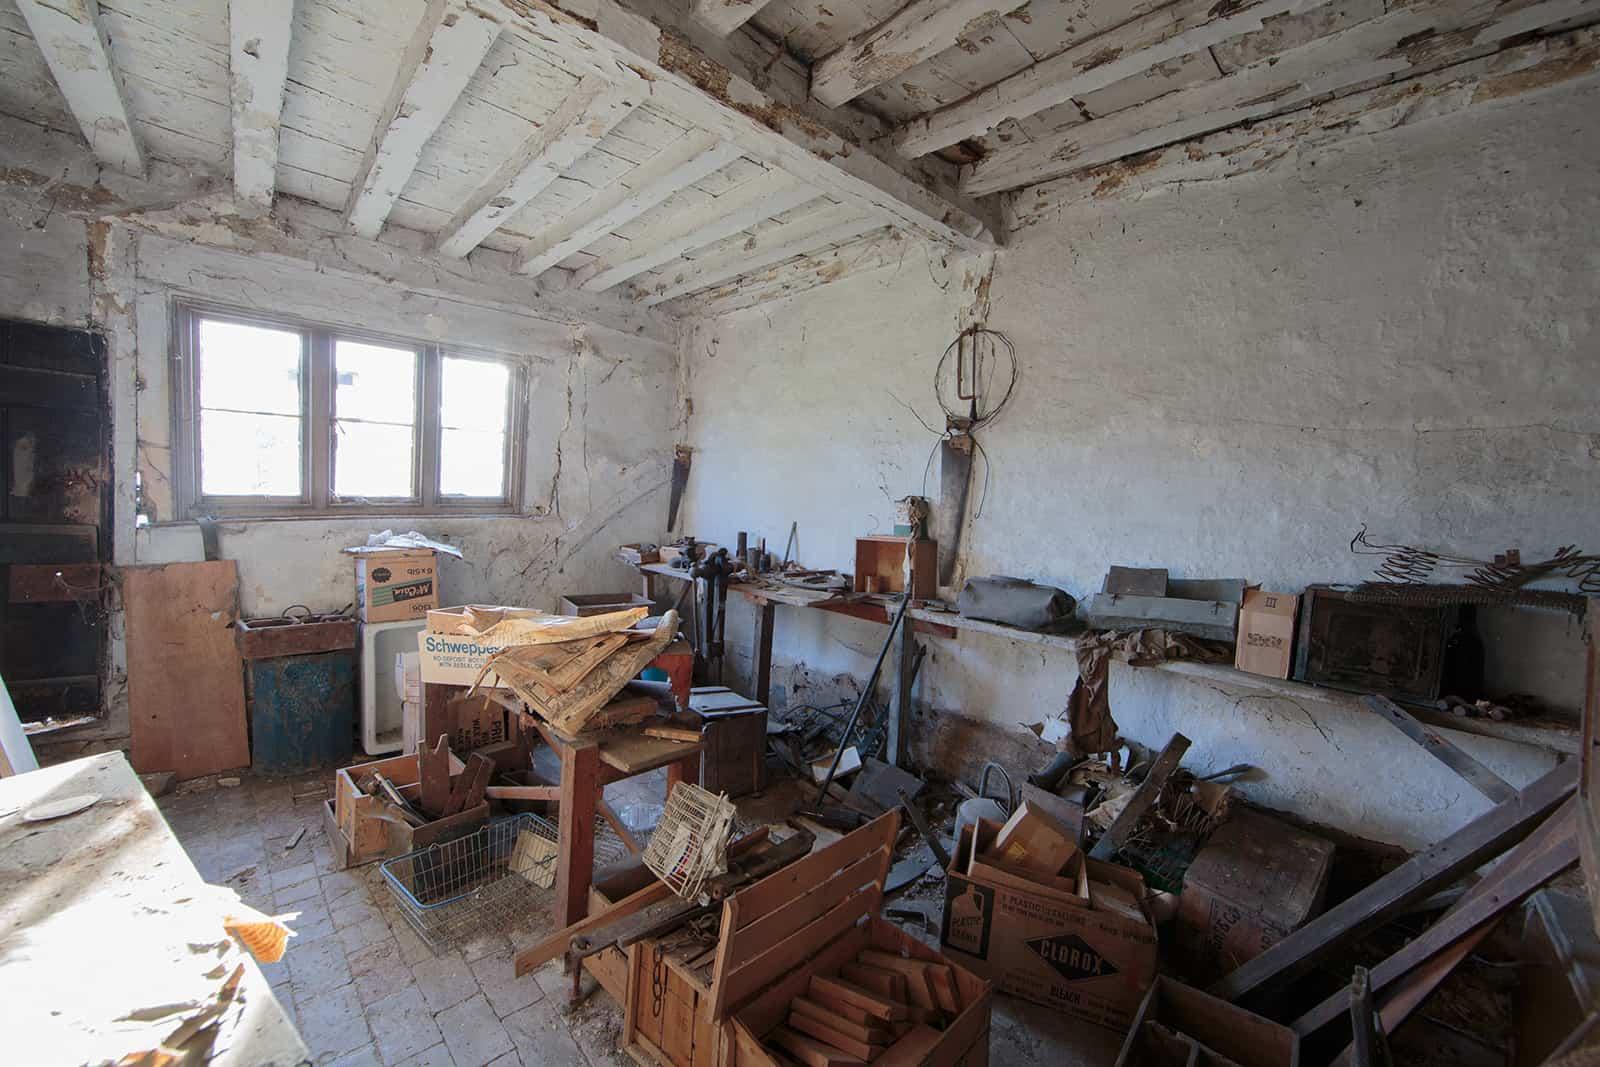 Workshop at Manor Farm in Spaldwick